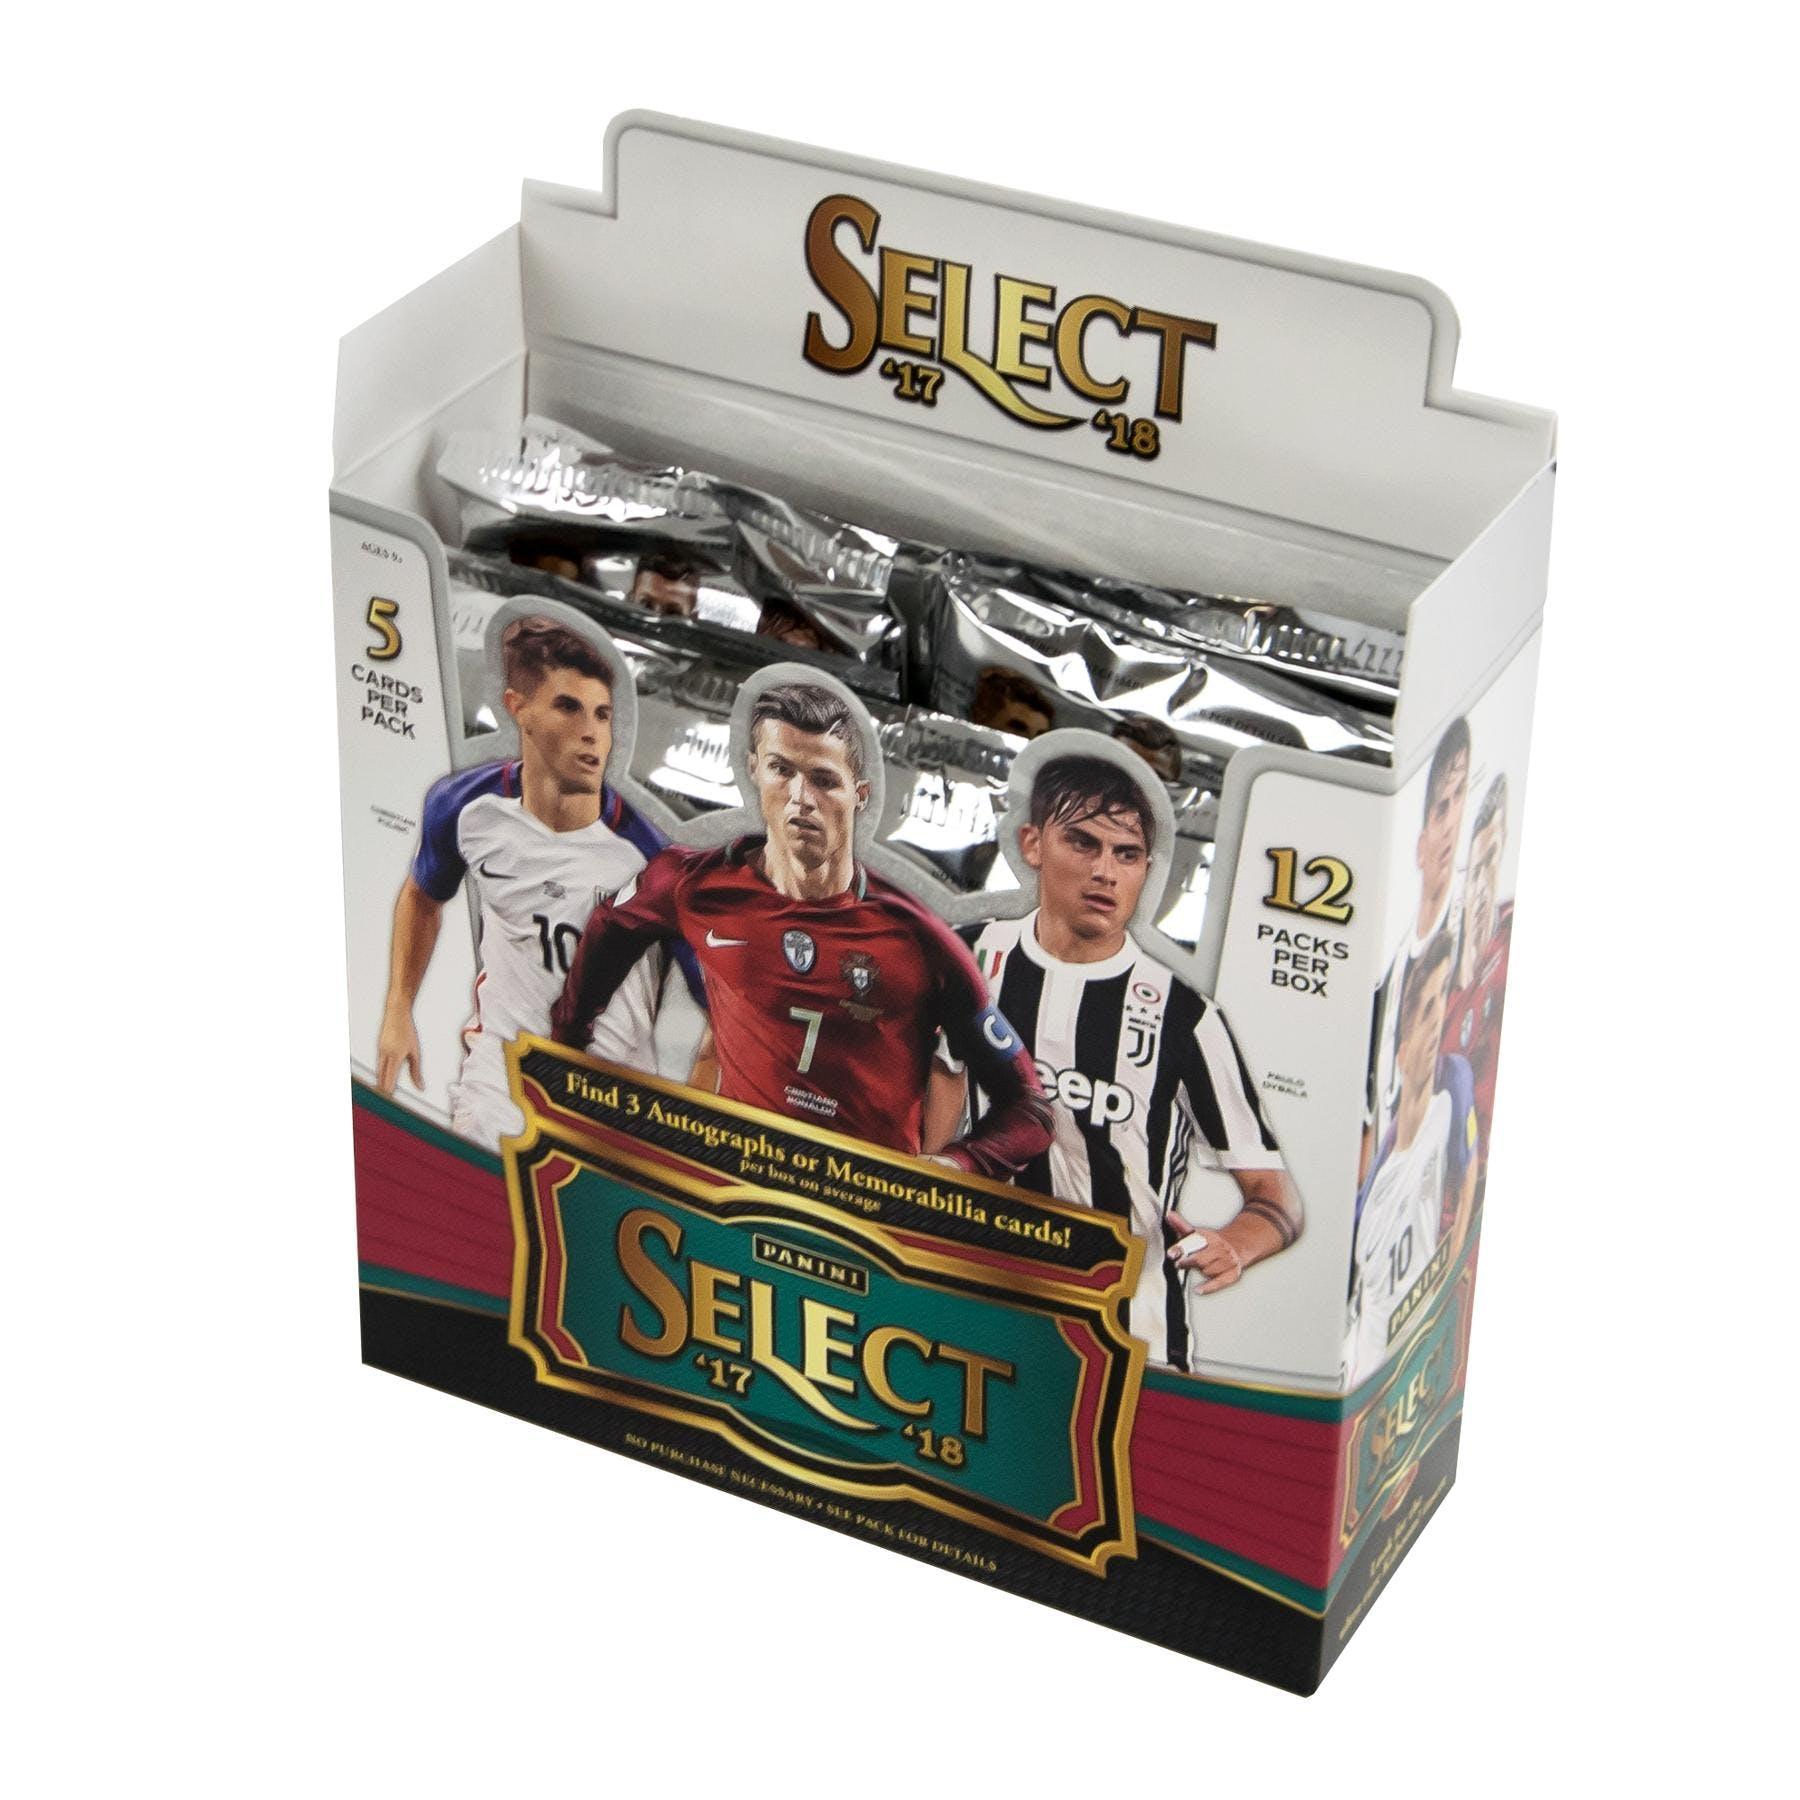 2017//18 PANINI SELECT SOCCER 20 CT RETAIL BOX LOT OF 5 BOXES